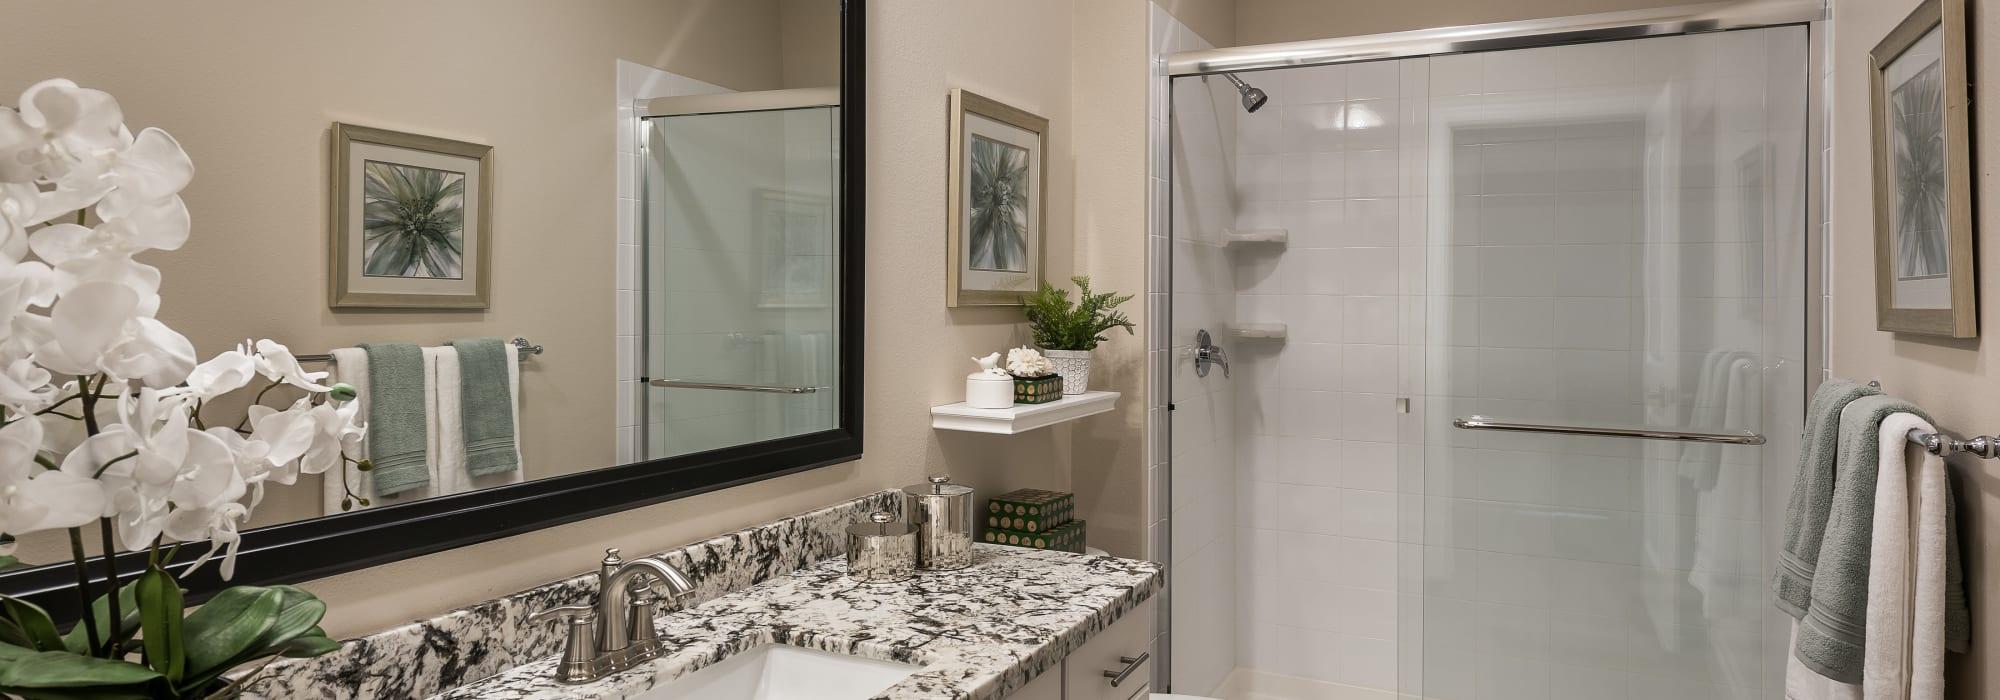 Bathroom with glass door shower at San Artes in Scottsdale, Arizona